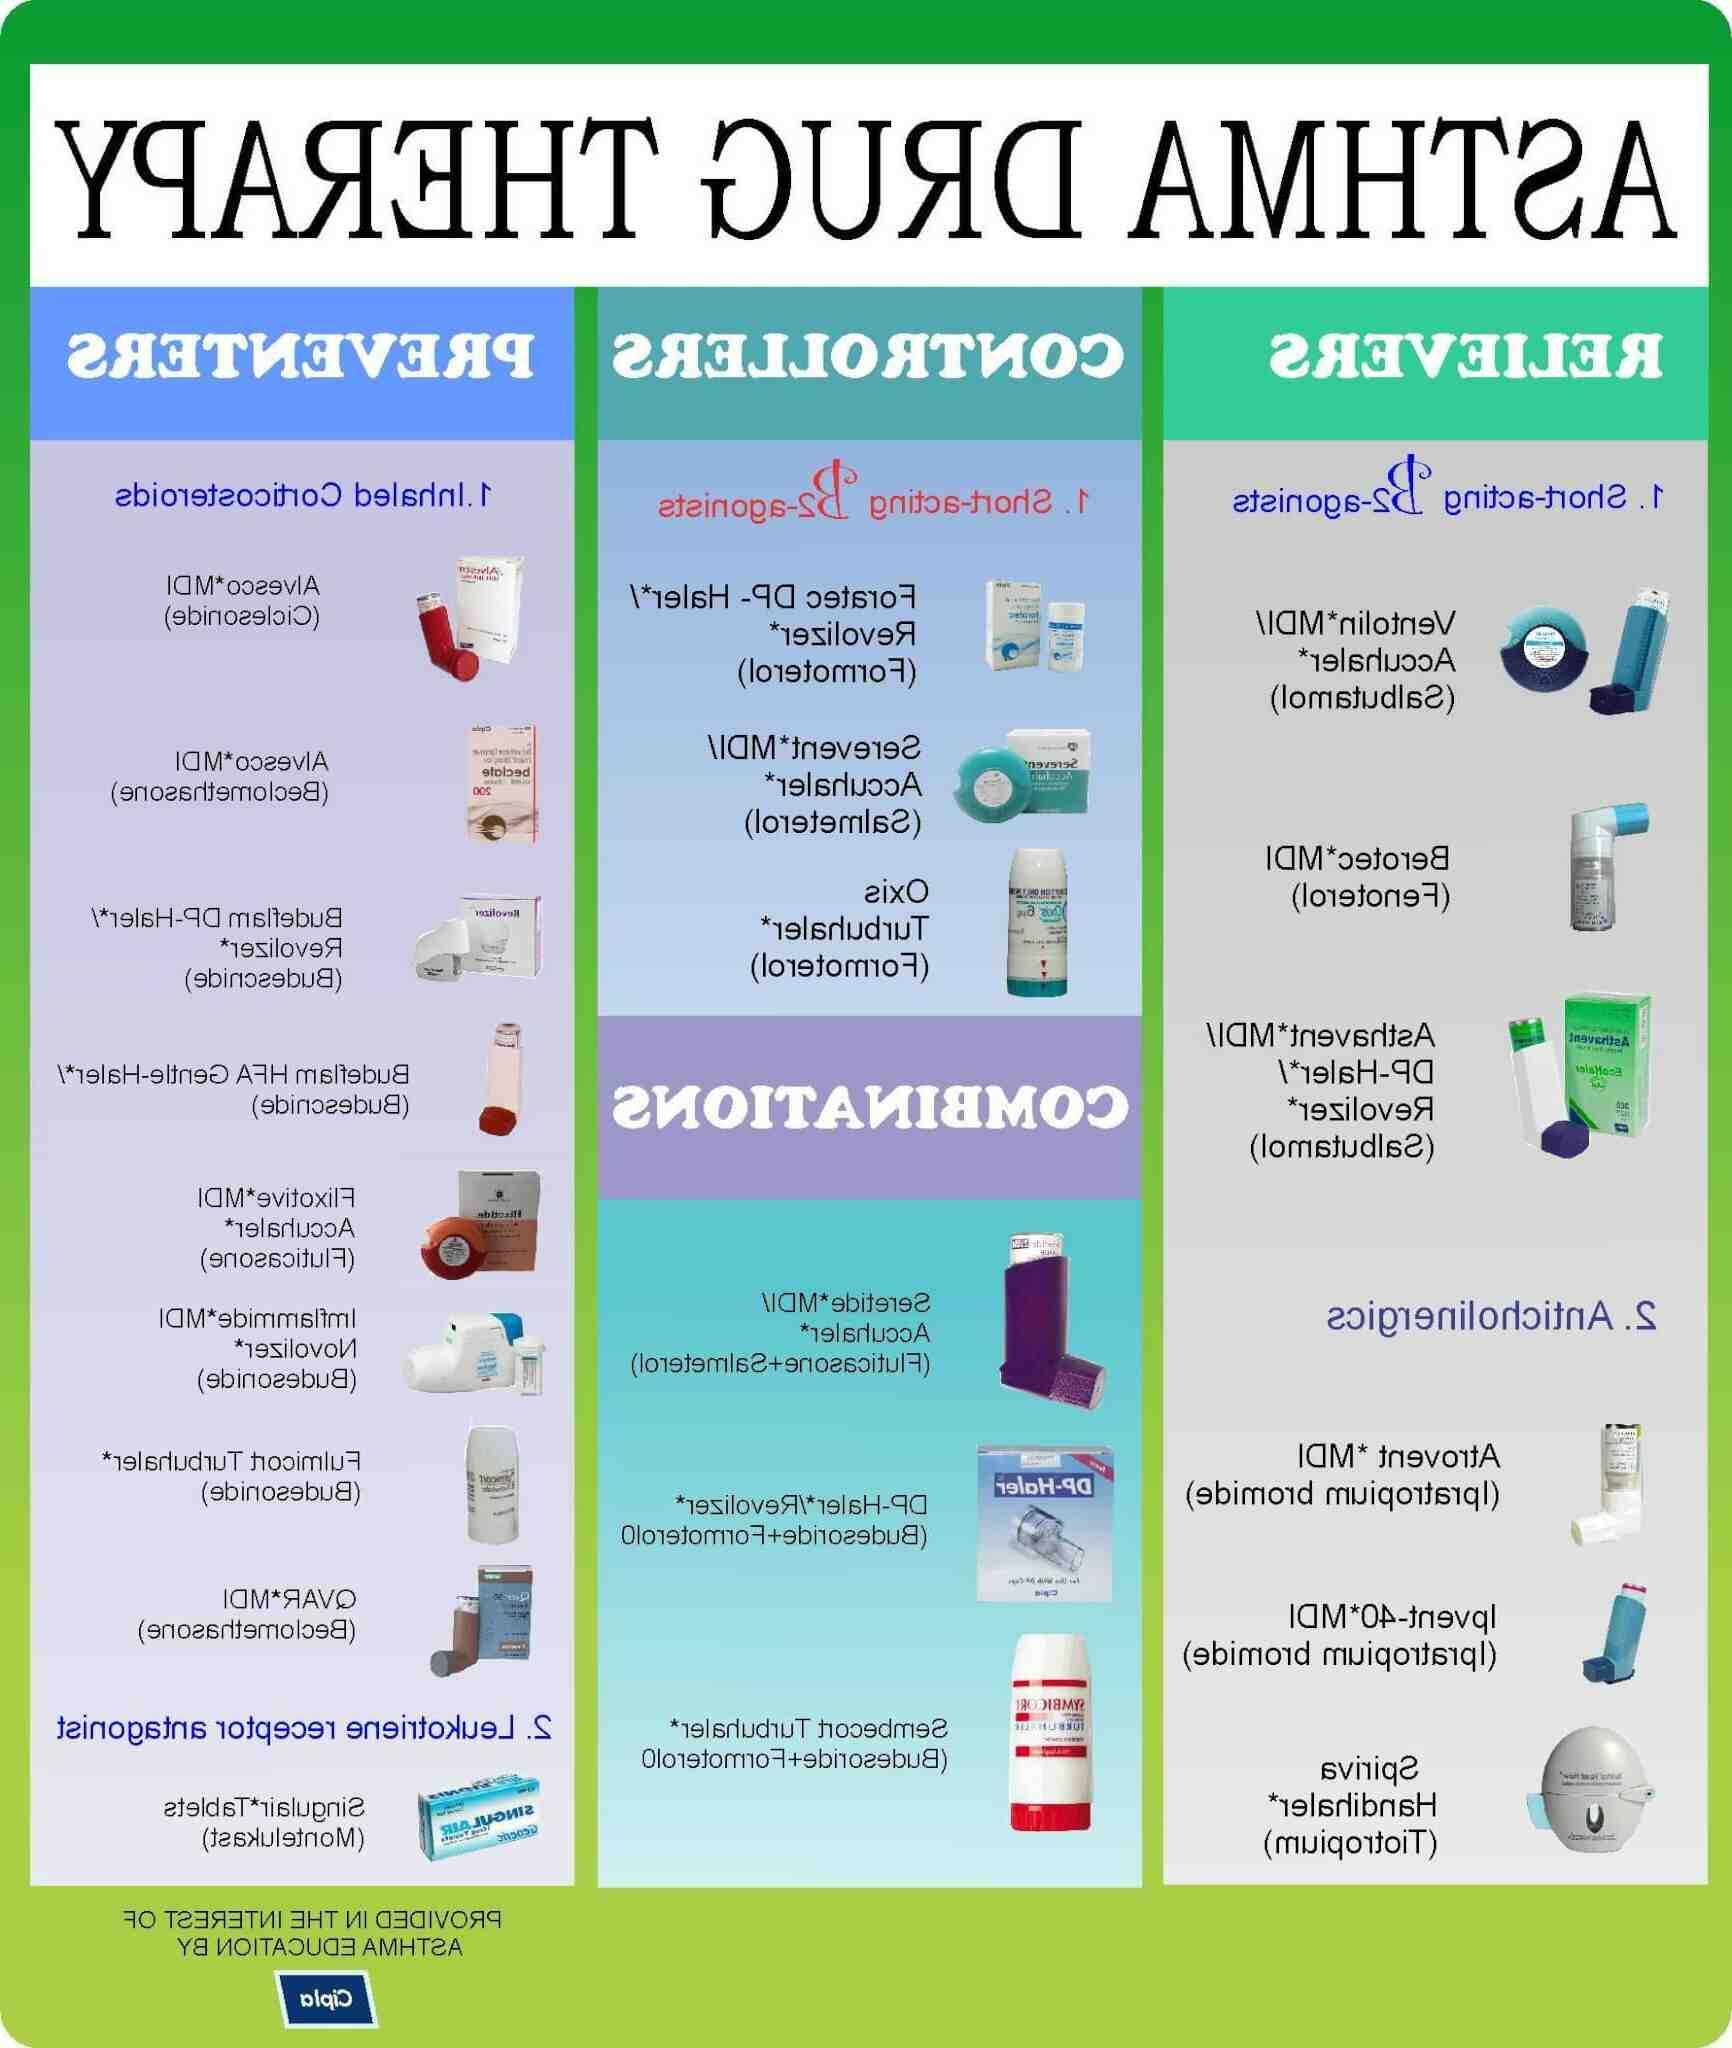 Comment traiter l'asthme